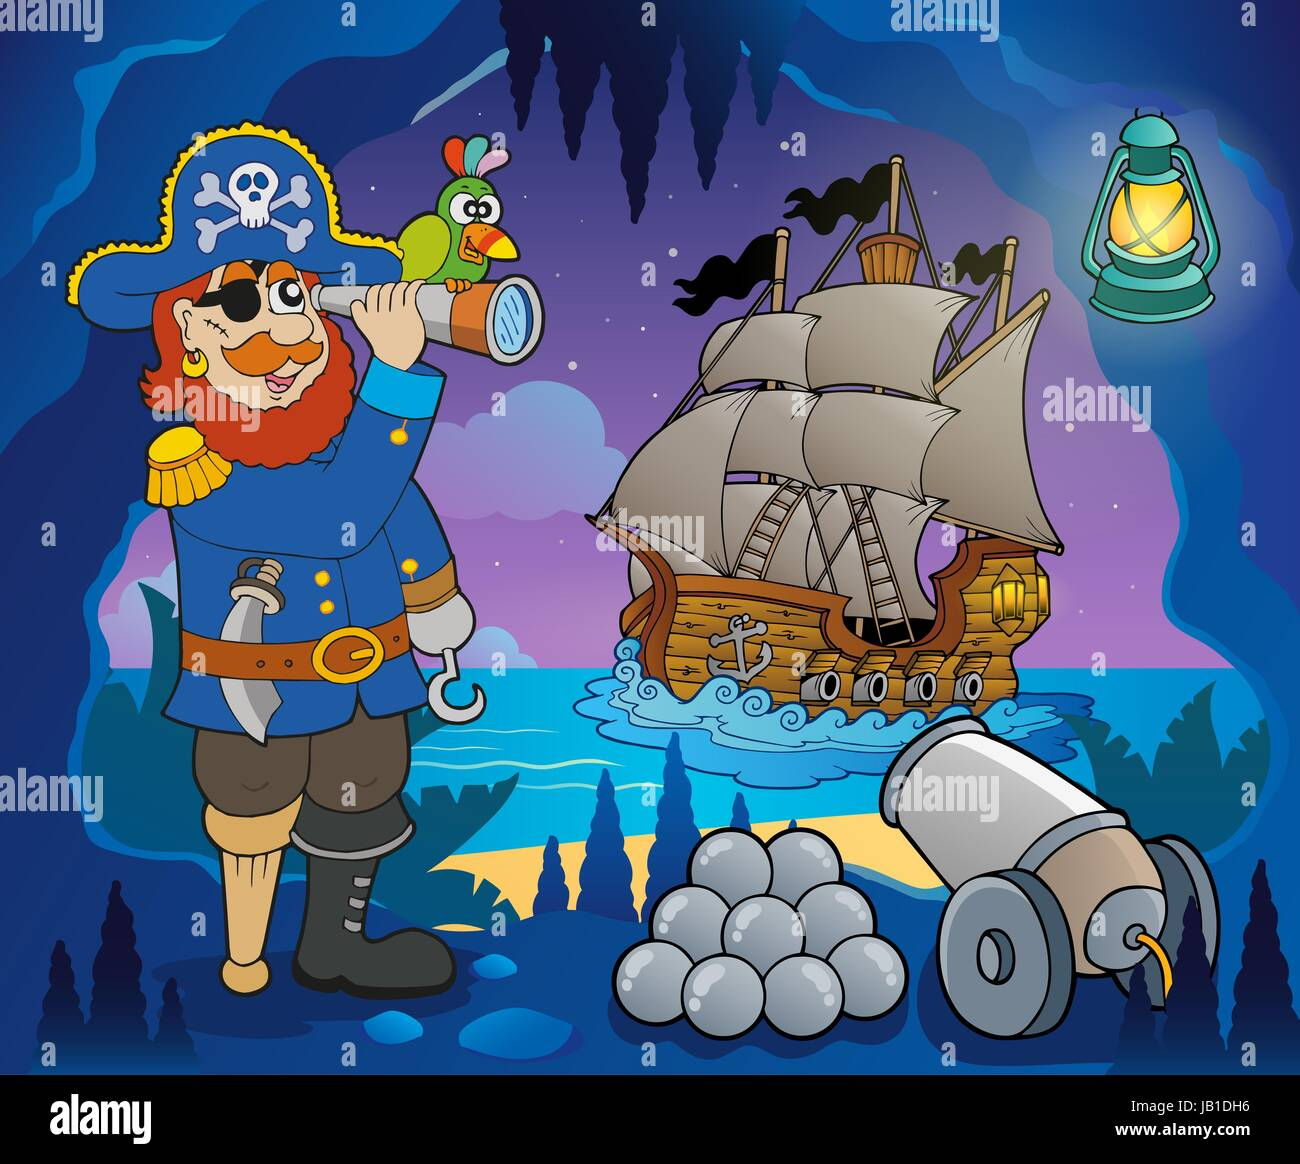 Pirate Cove Thema Bild 5 - Bild-Darstellung. Stockbild